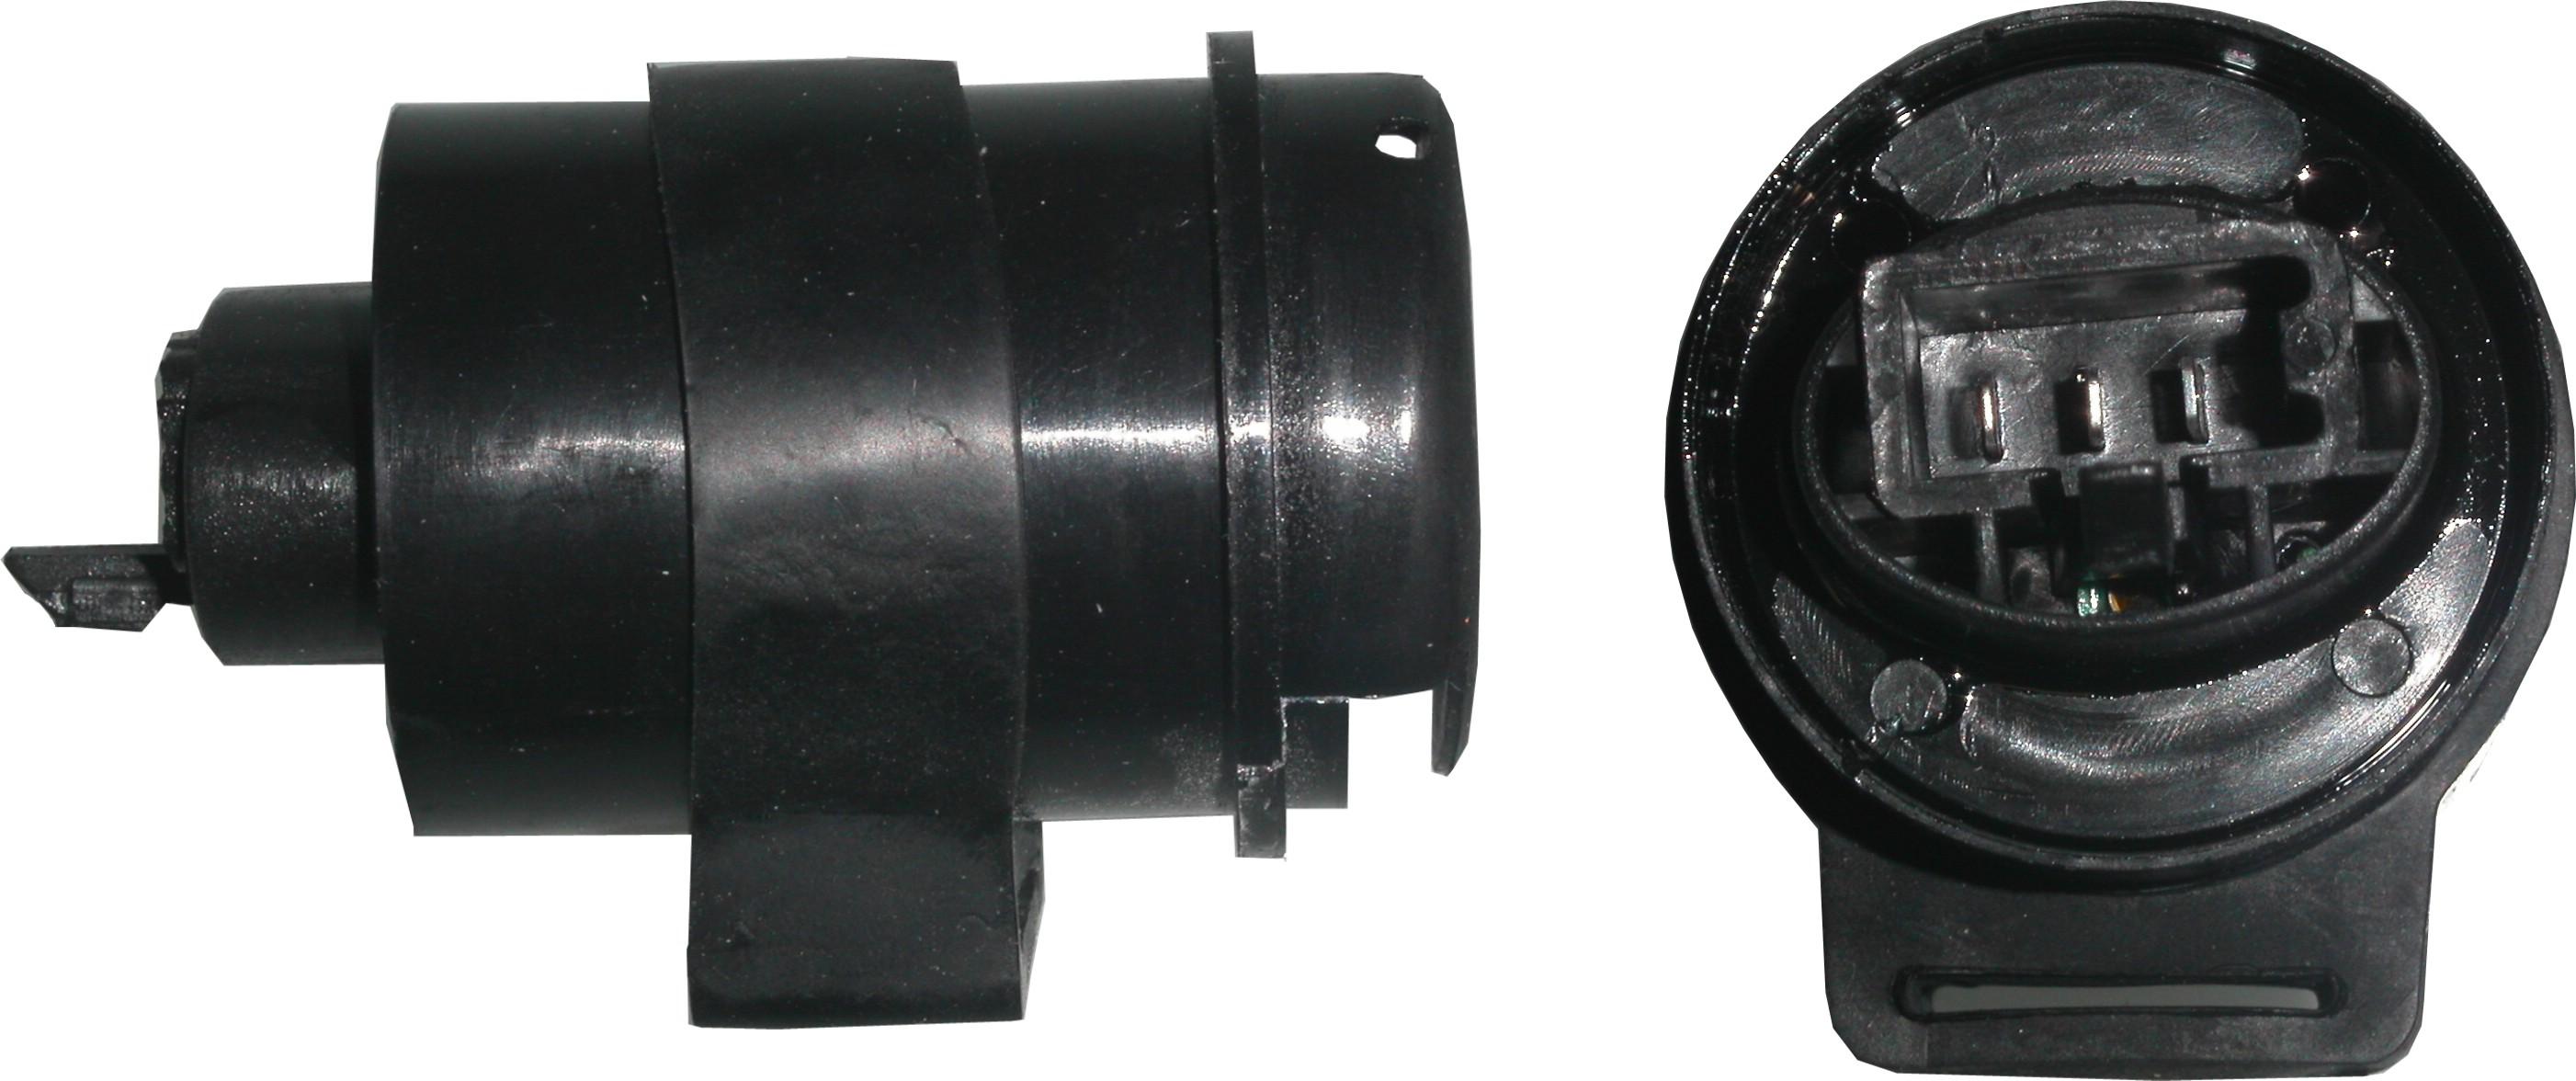 Yamaha FJ 1200 38301-MG8-681 1991-1994 Indicator Relay Each Europe